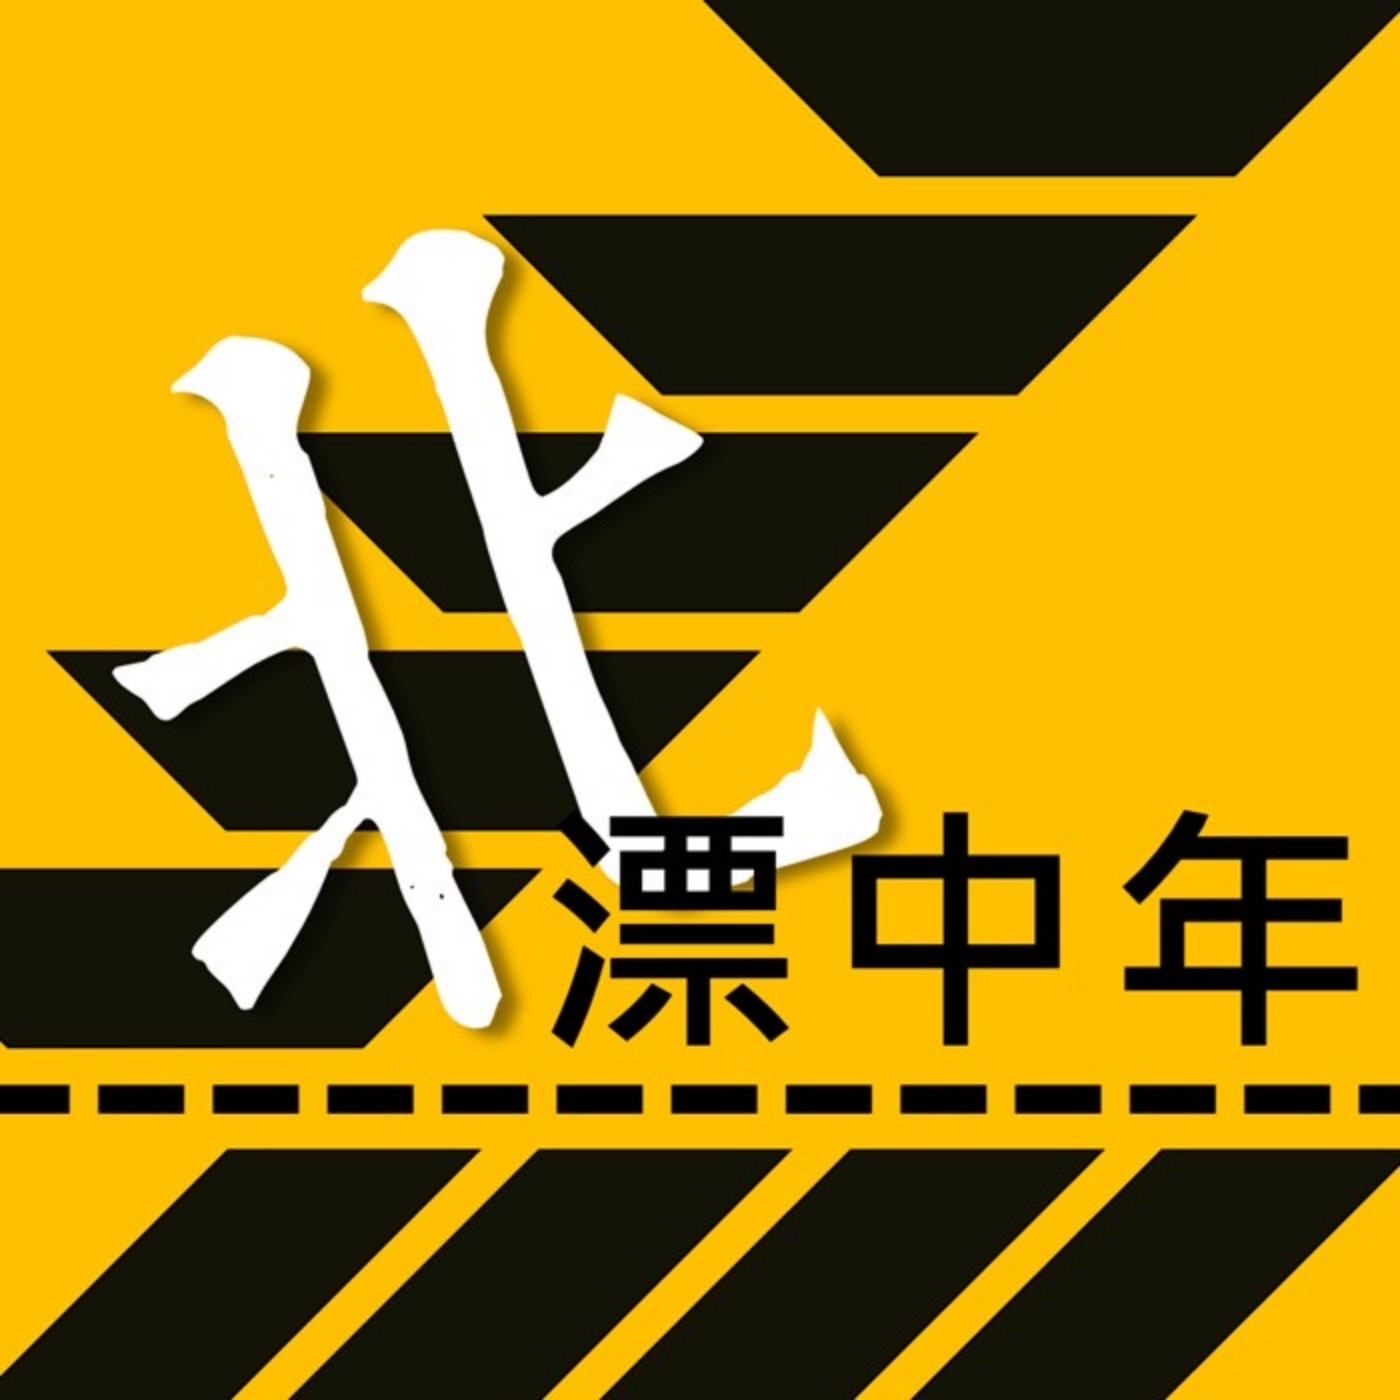 EP.28 車展SG失業潮 & 車展活動承辦人喝不到免錢下午茶怎麼辦